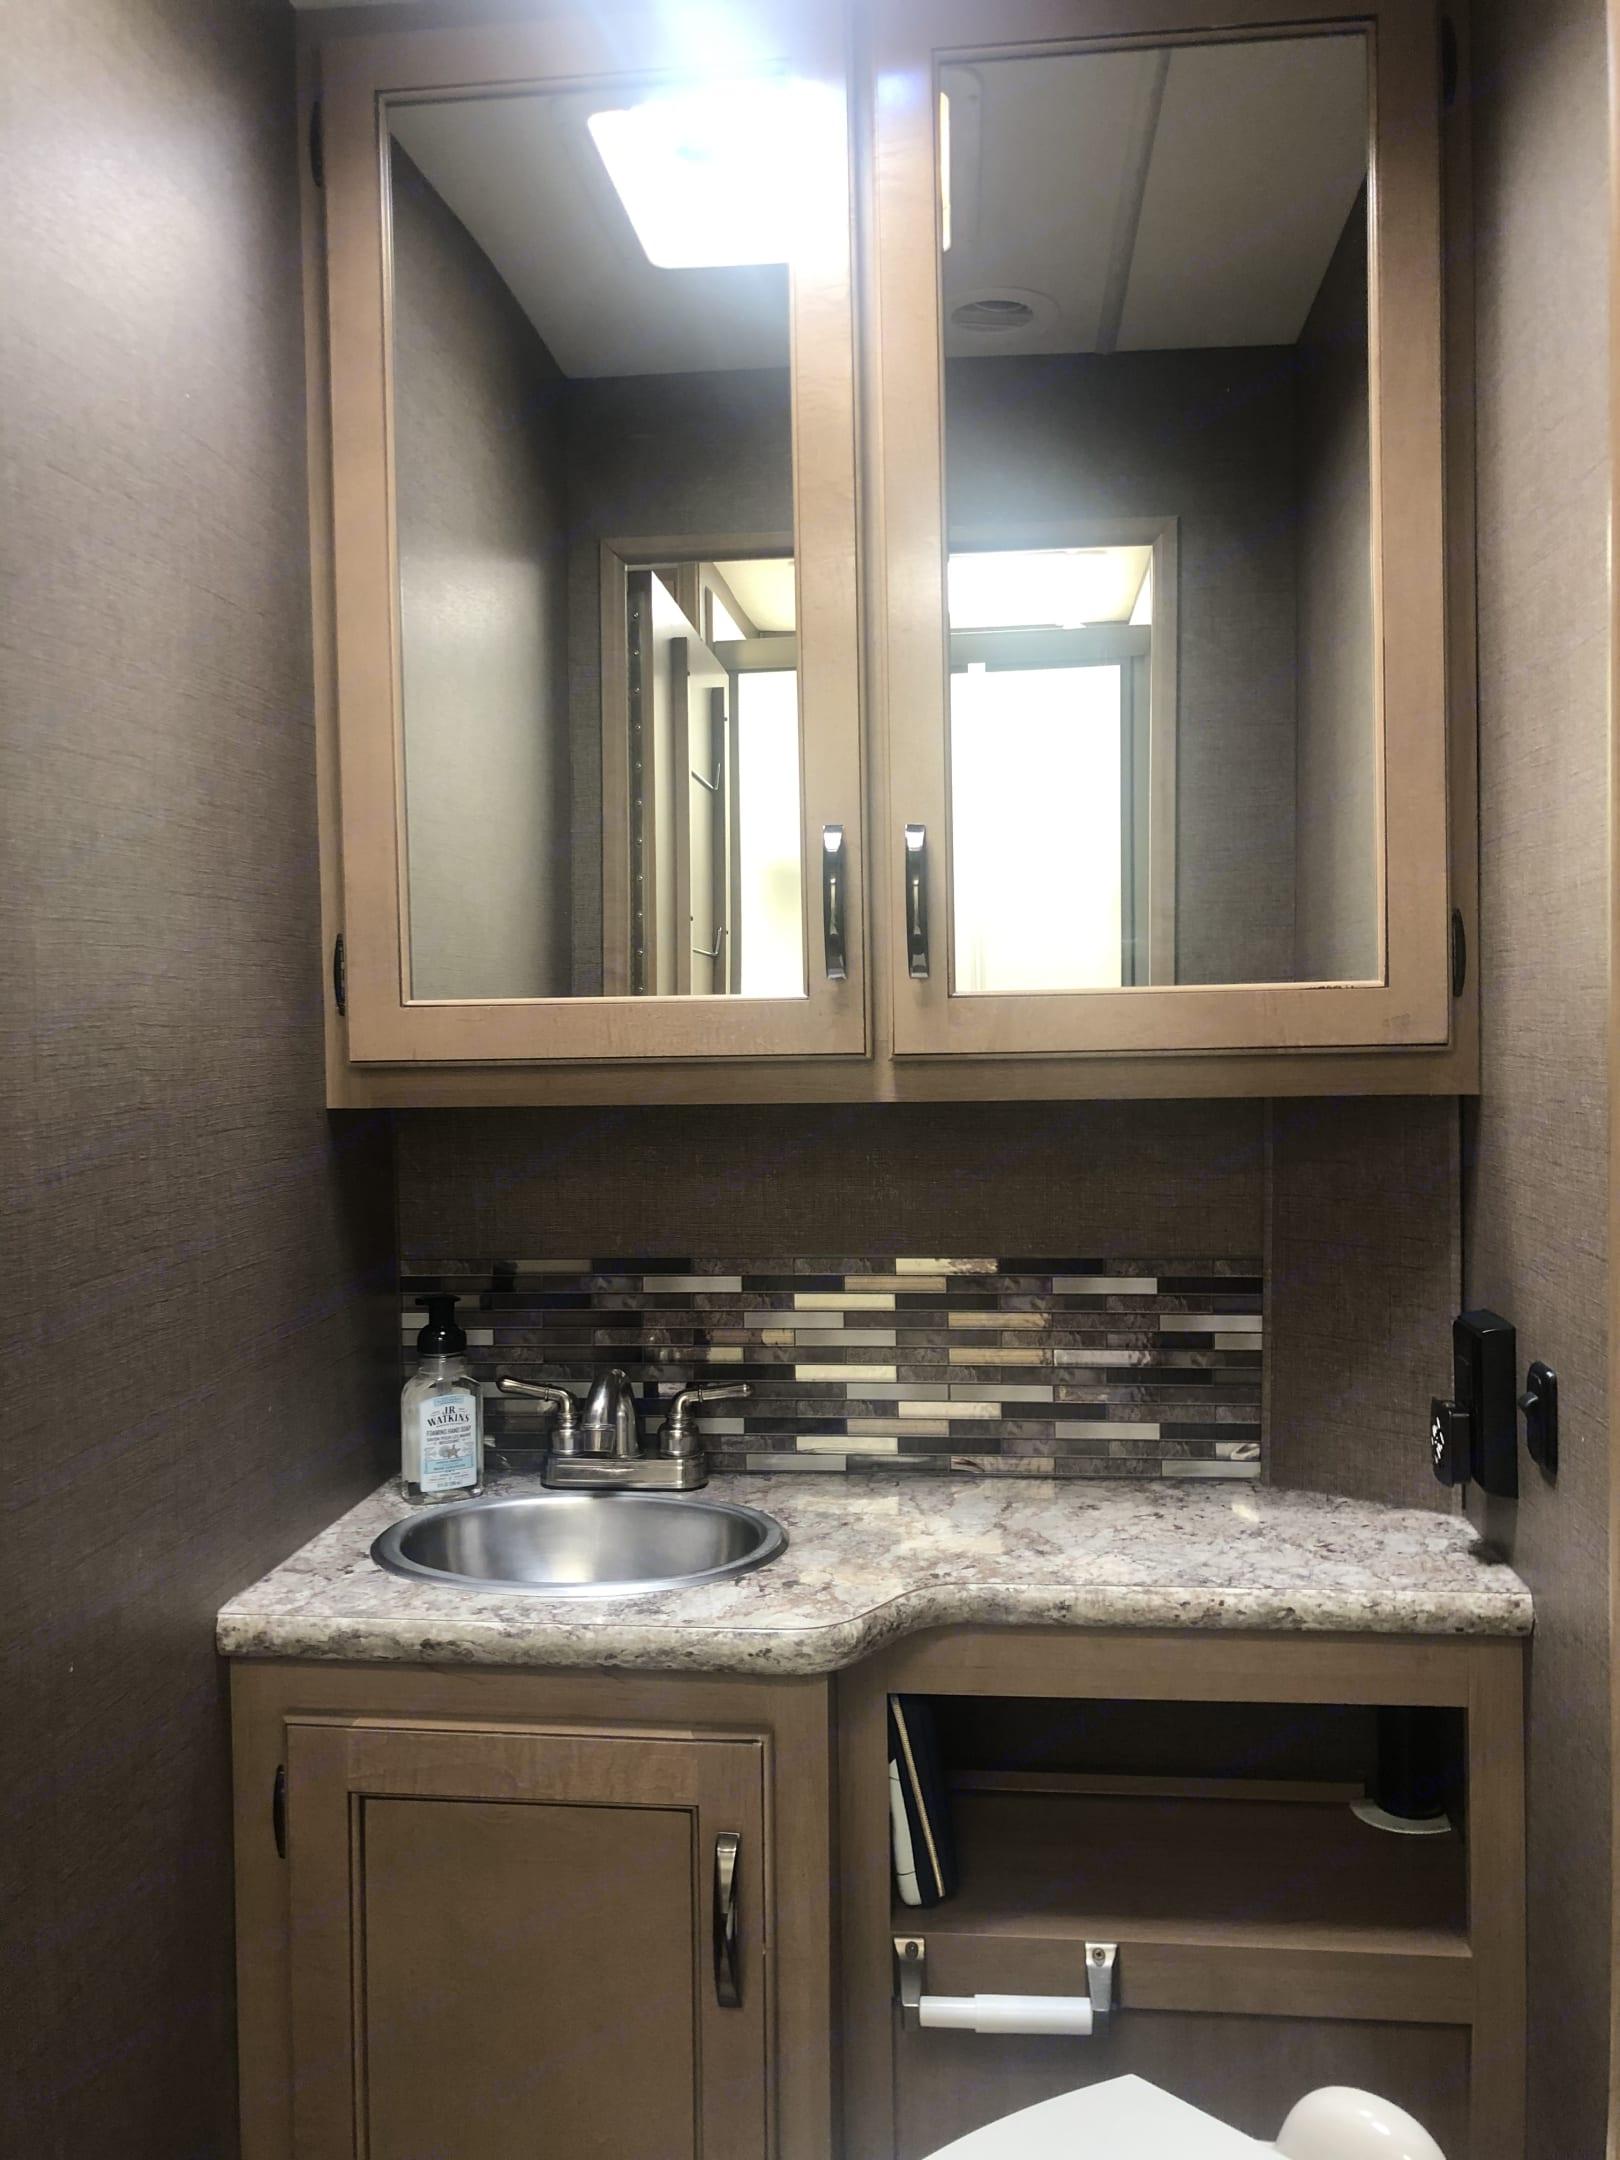 Spacious bathroom with plenty of storage. Thor Motor Coach Four Winds 2019